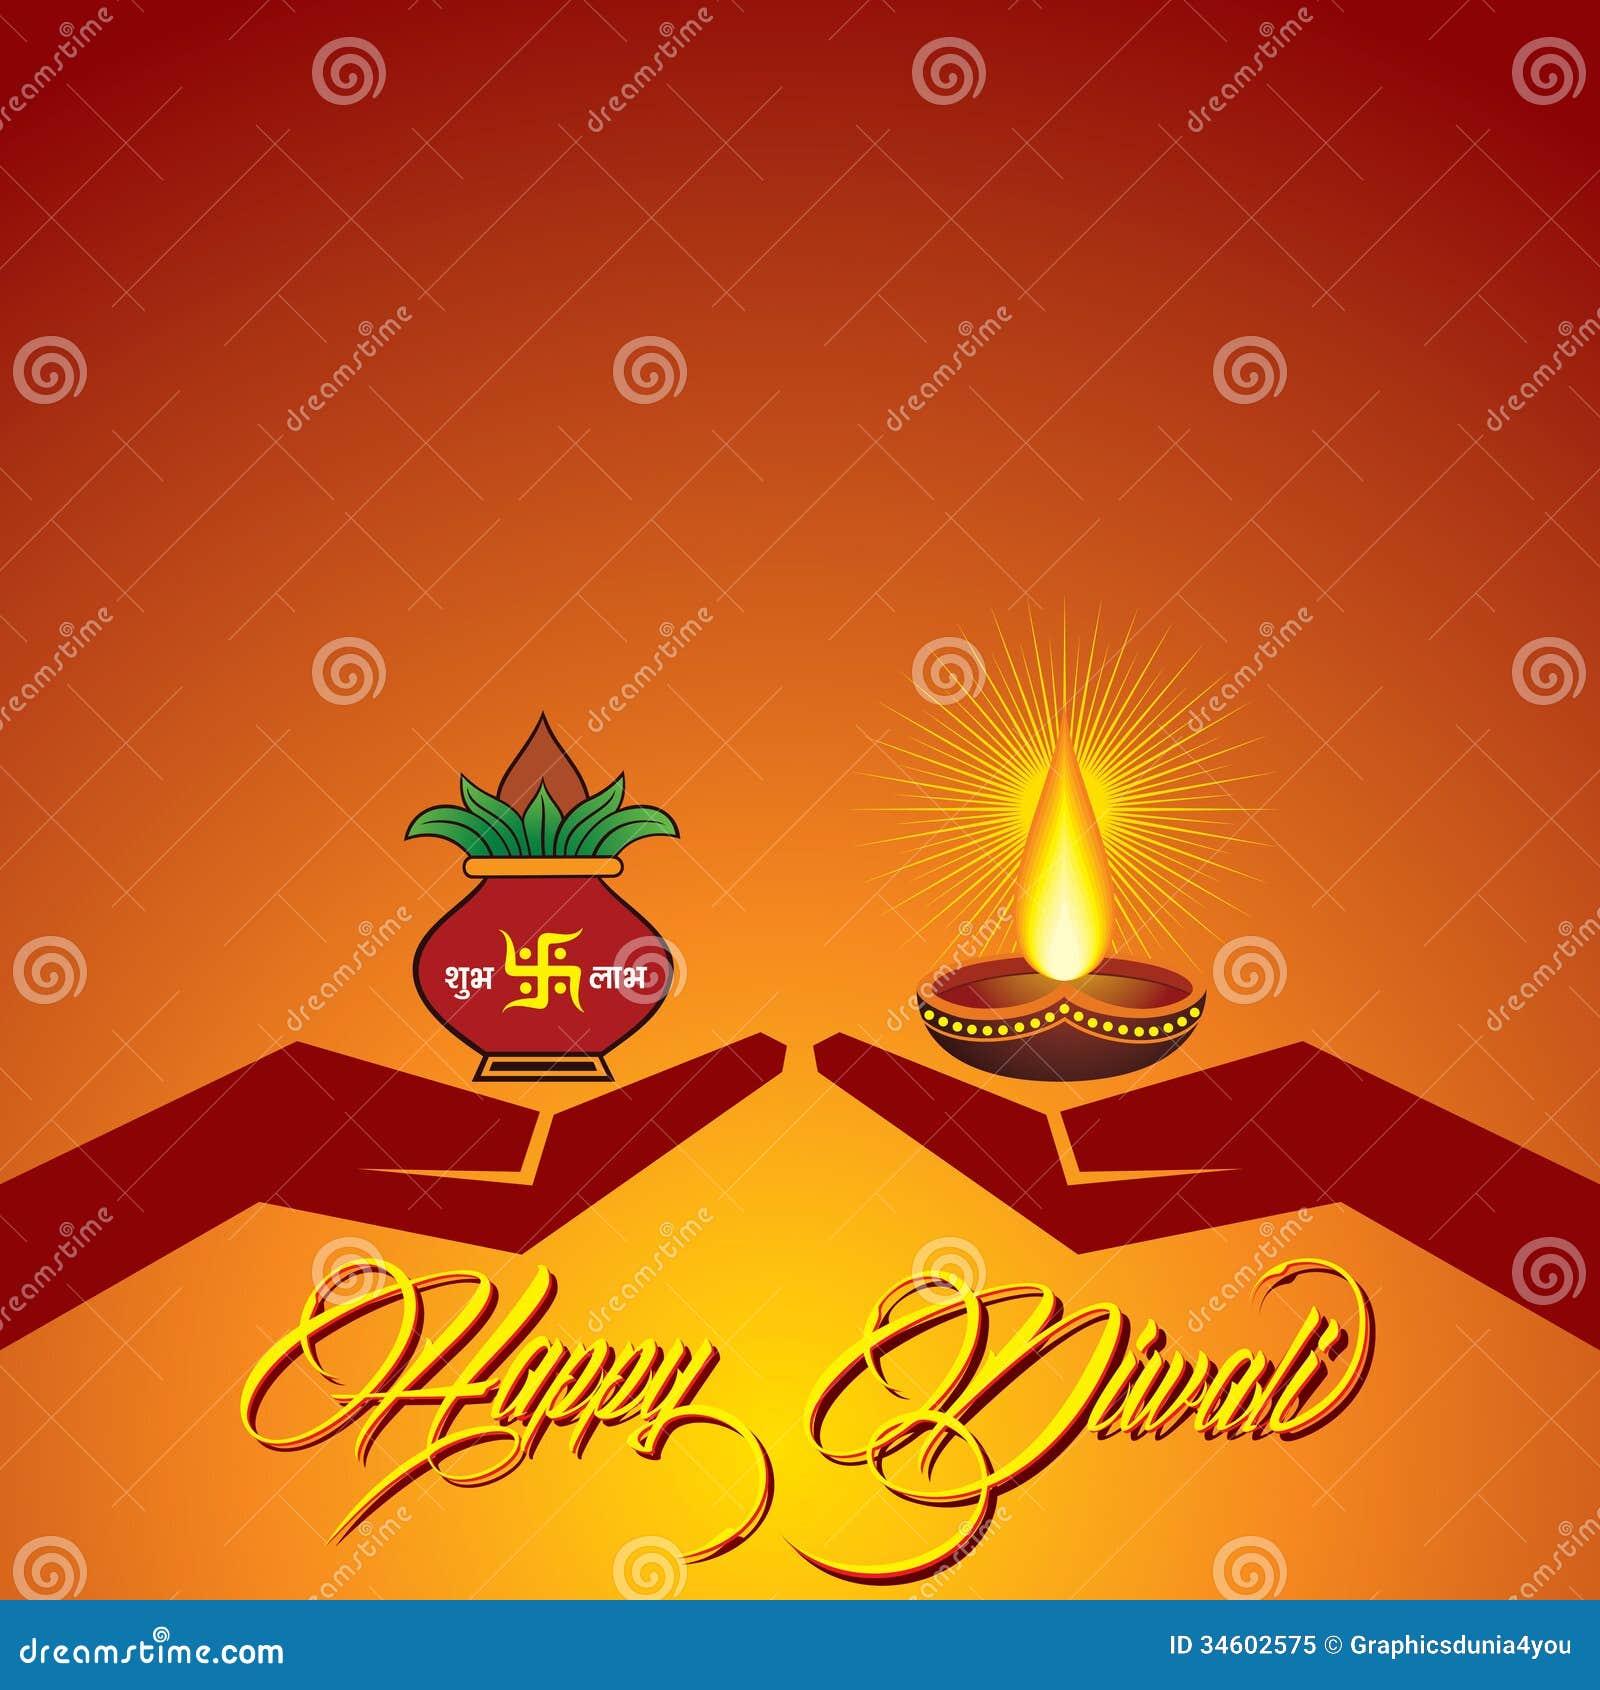 Diwali Greeting Background Stock Vector Illustration Of Diwali